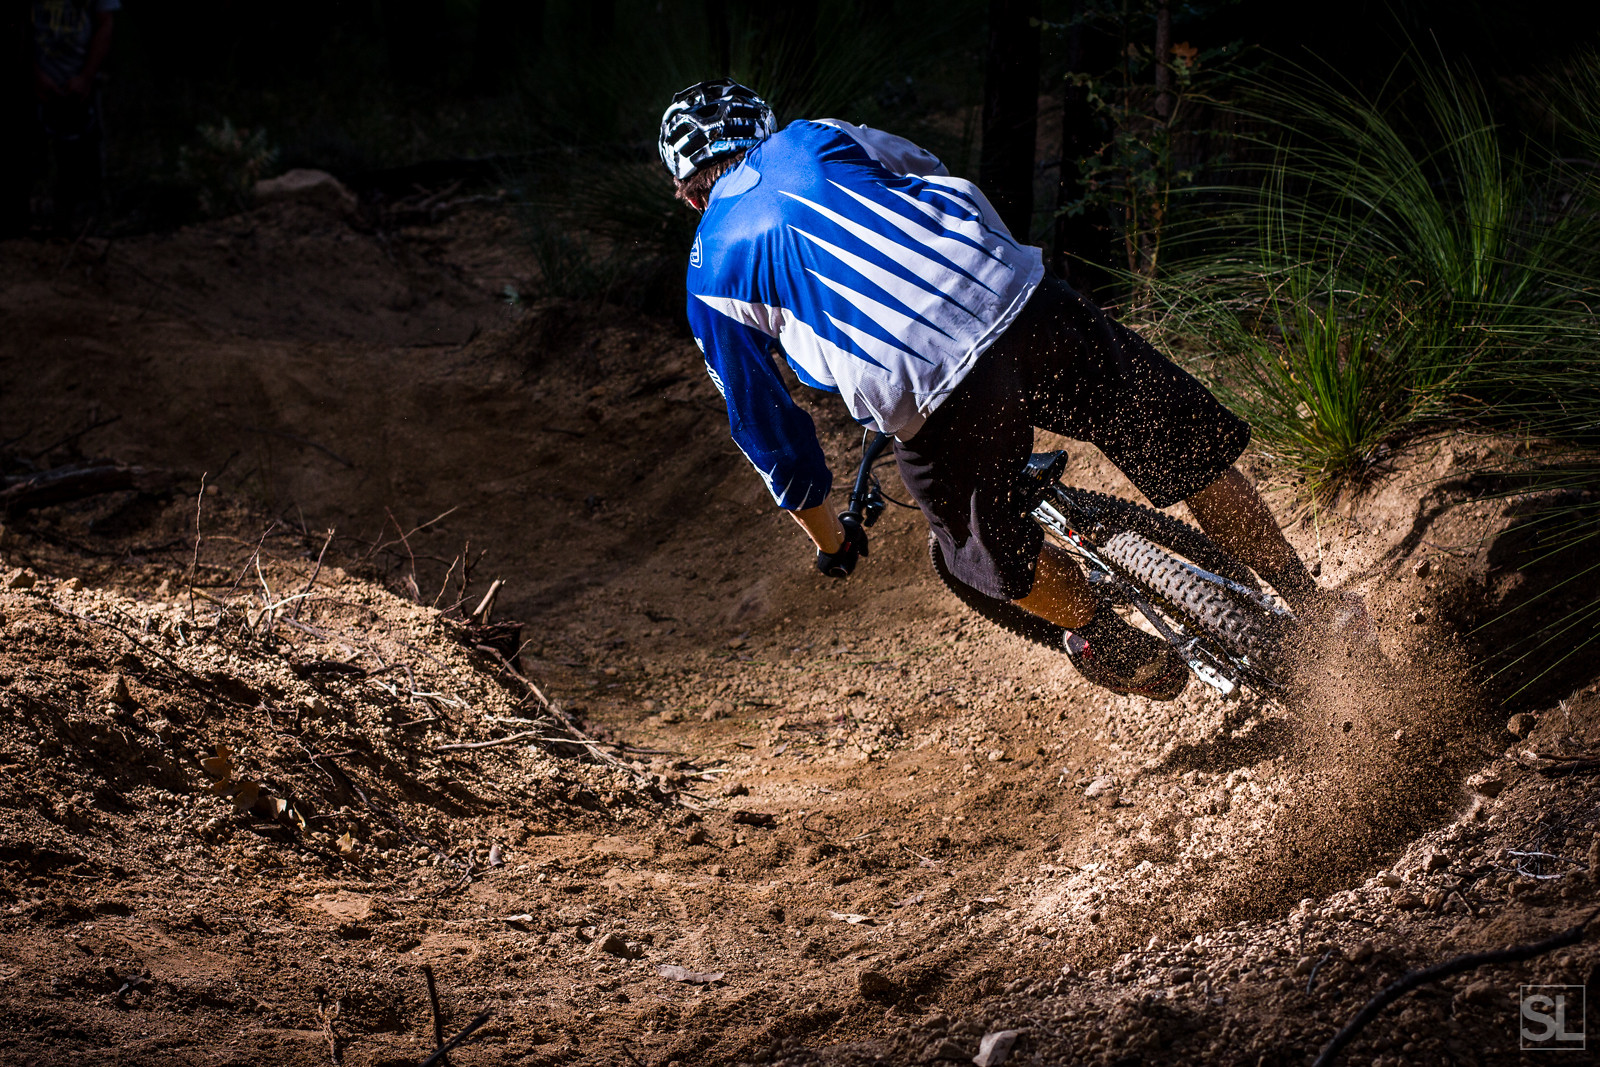 shredding gravel corners - Chamakazi - Mountain Biking Pictures - Vital MTB